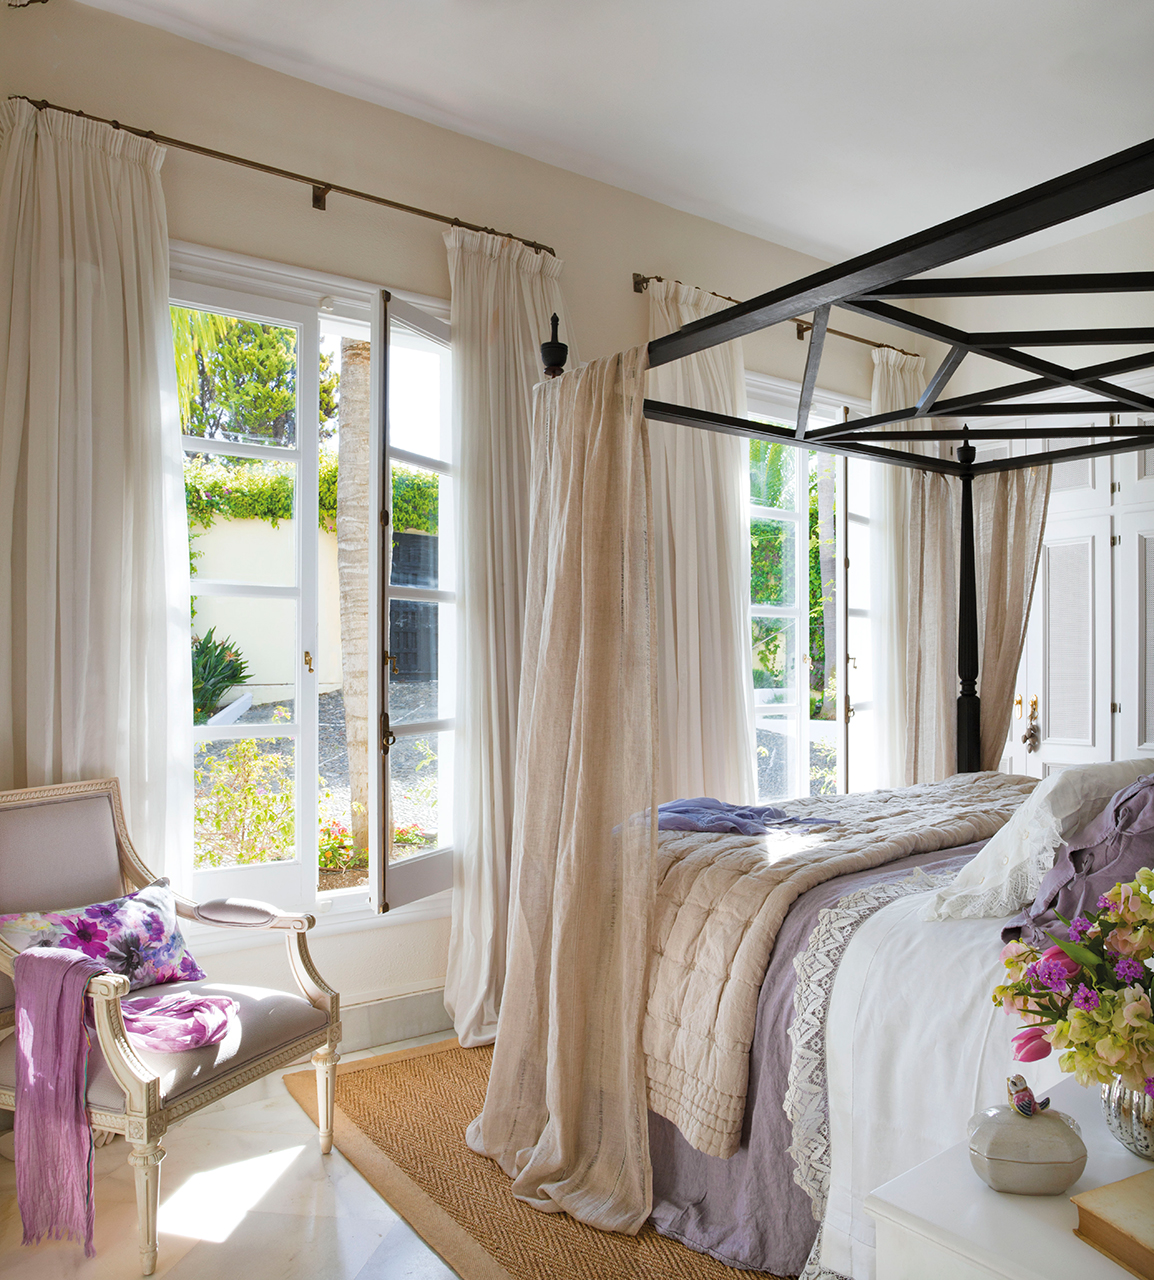 спальня кровать балдахин кресло